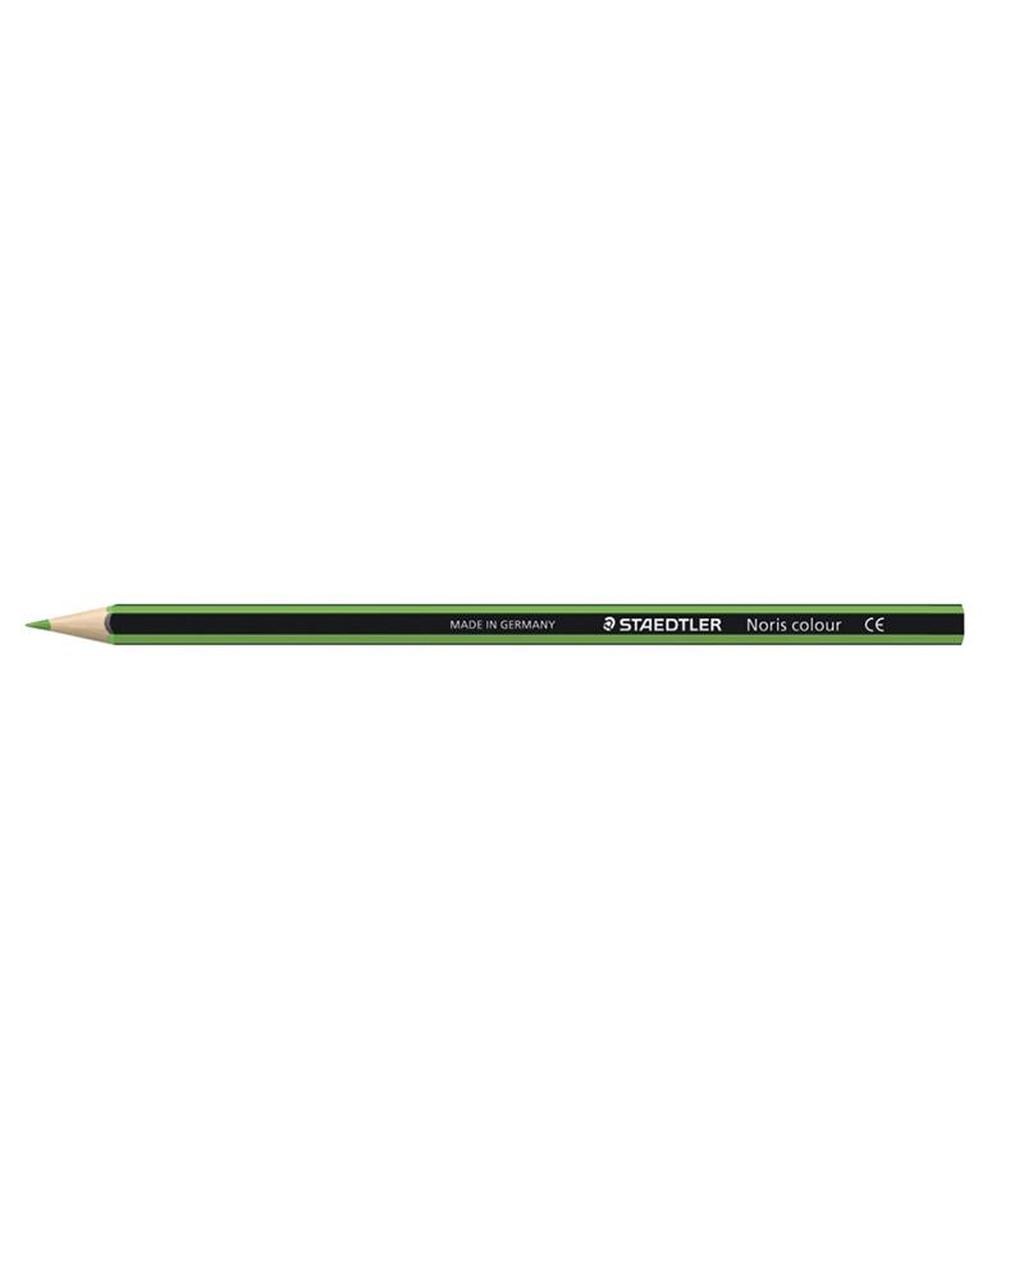 Staedtler Noris Colour Colouring Pencils - Light Green